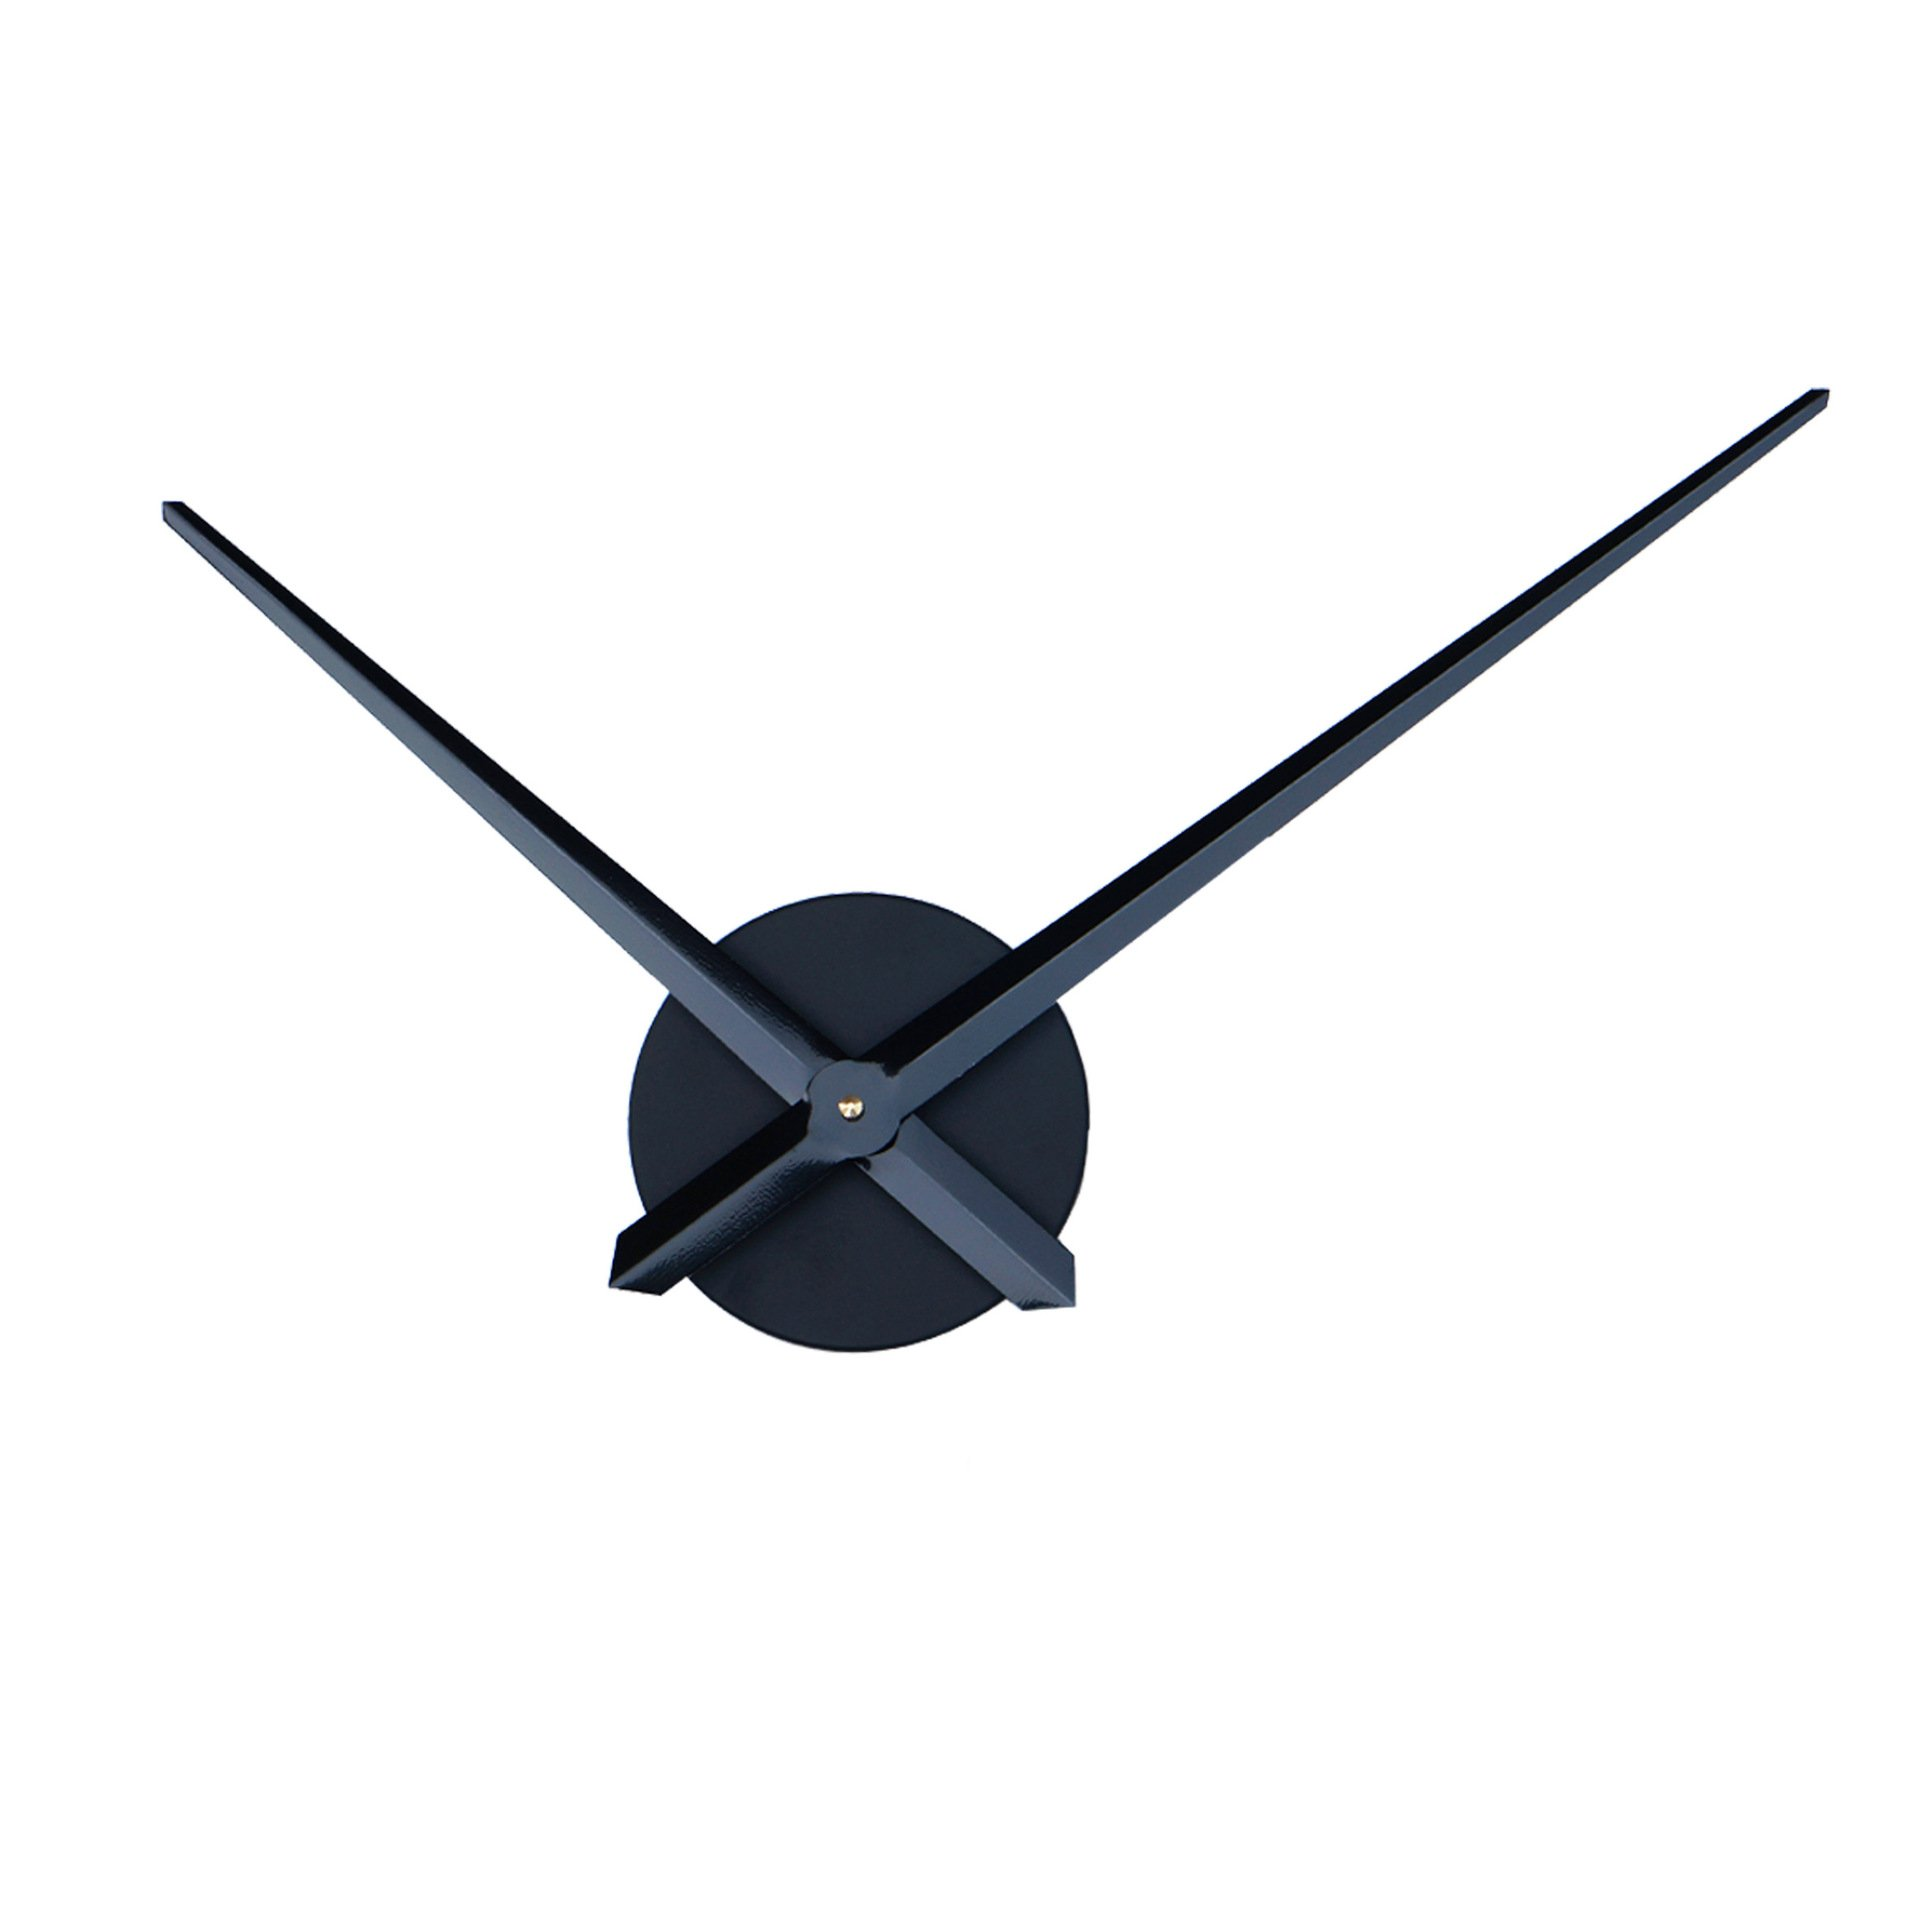 Reliable-E Aluminum Clock Hands Power Movement DIY Wall Clock Kit (Black)